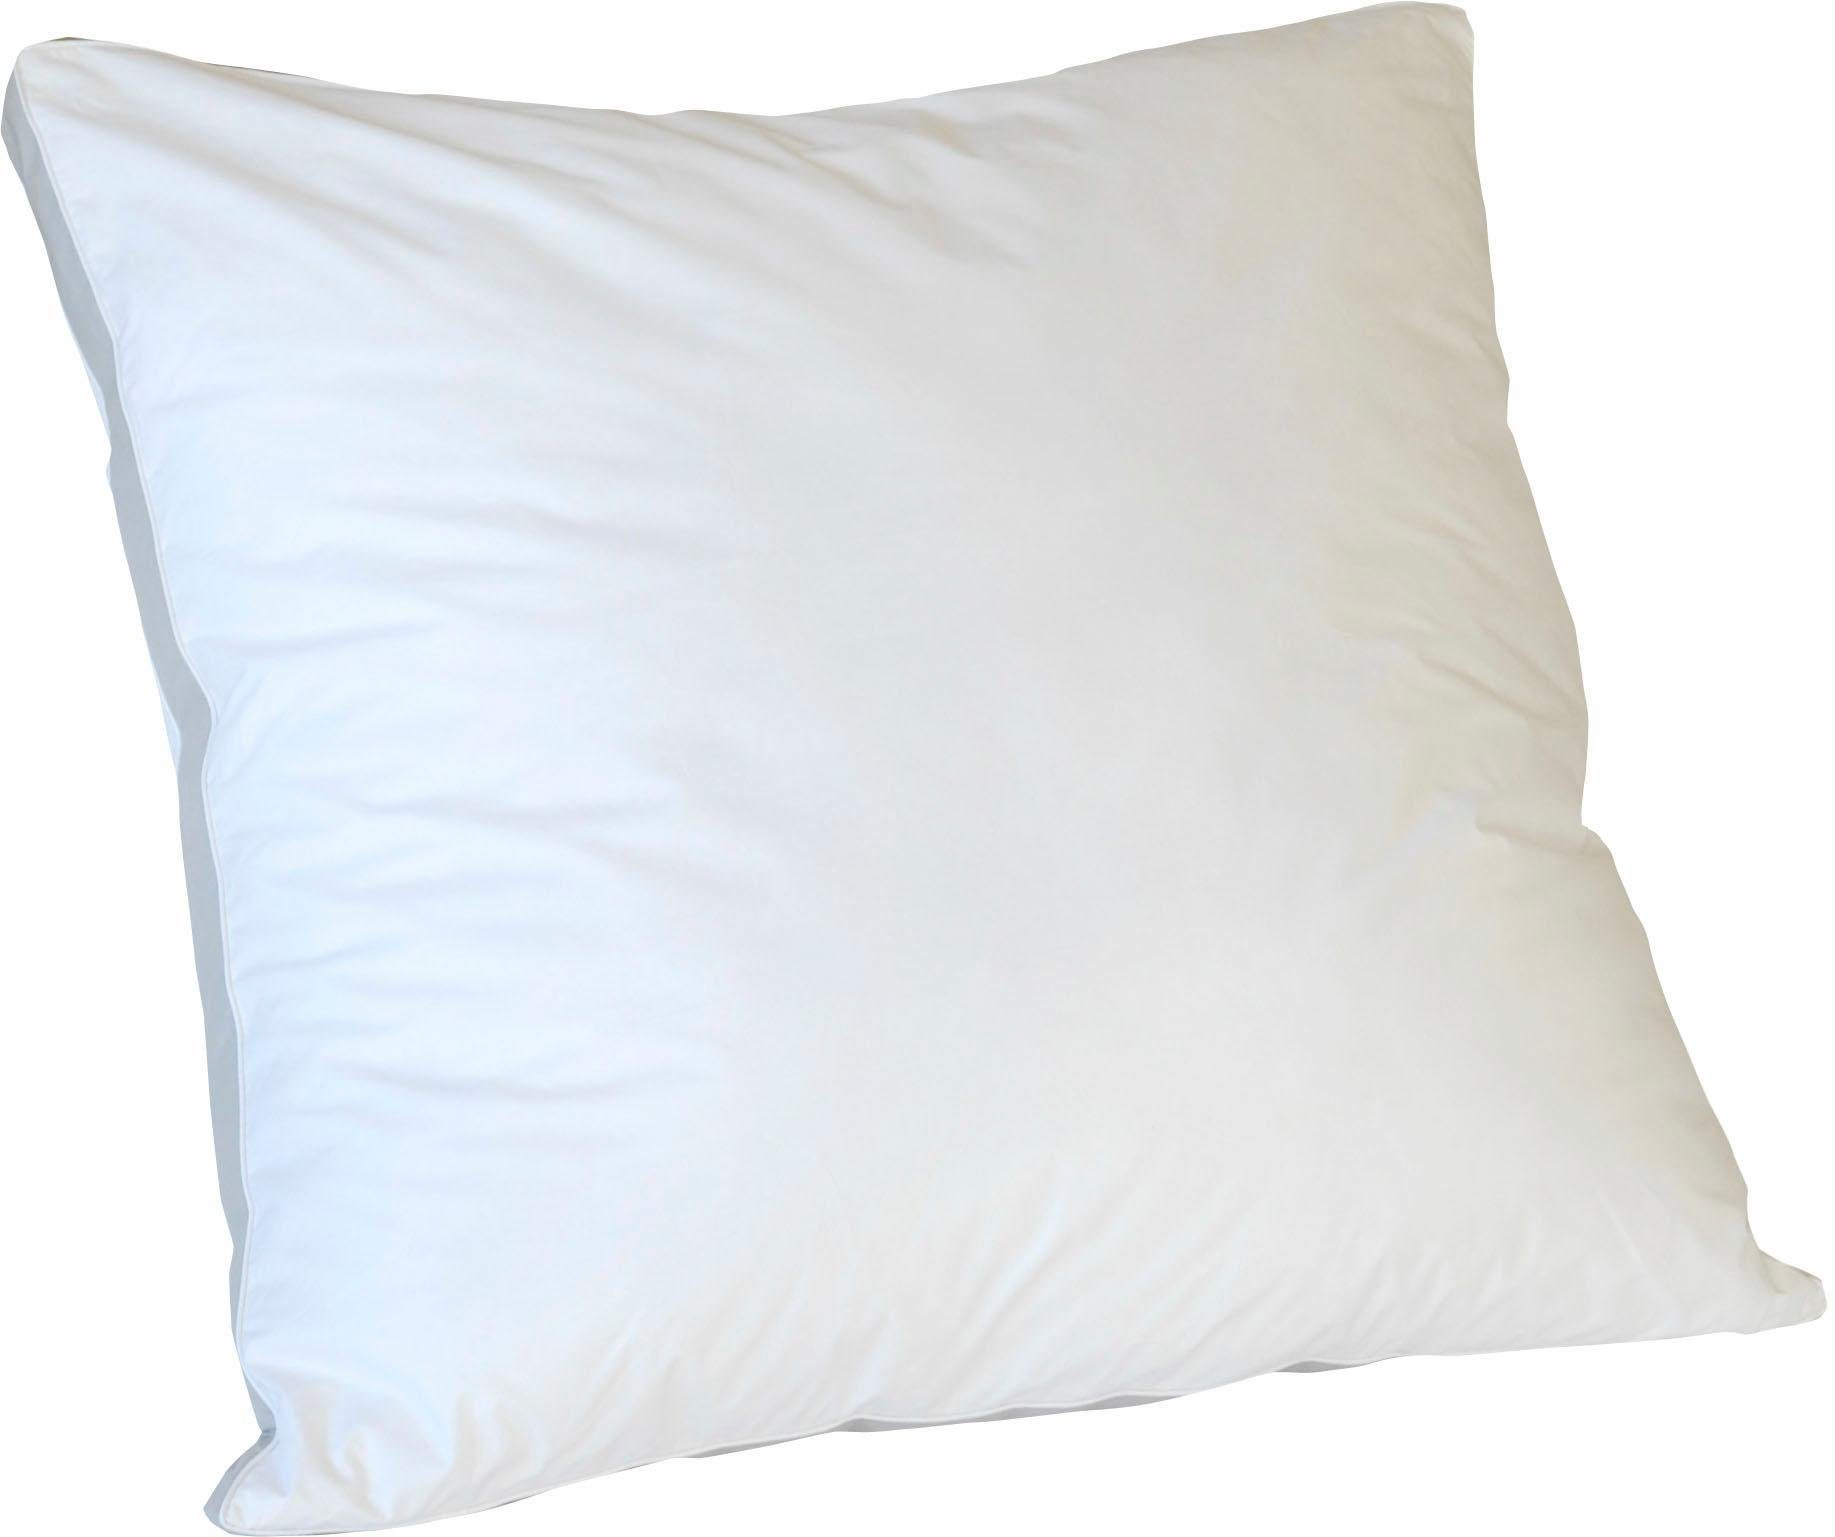 3-Kammer-Kopfkissen, »Wellness Hybrid«, KBT Bettwaren, Bezug: 100% Baumwolle, (1-tlg)